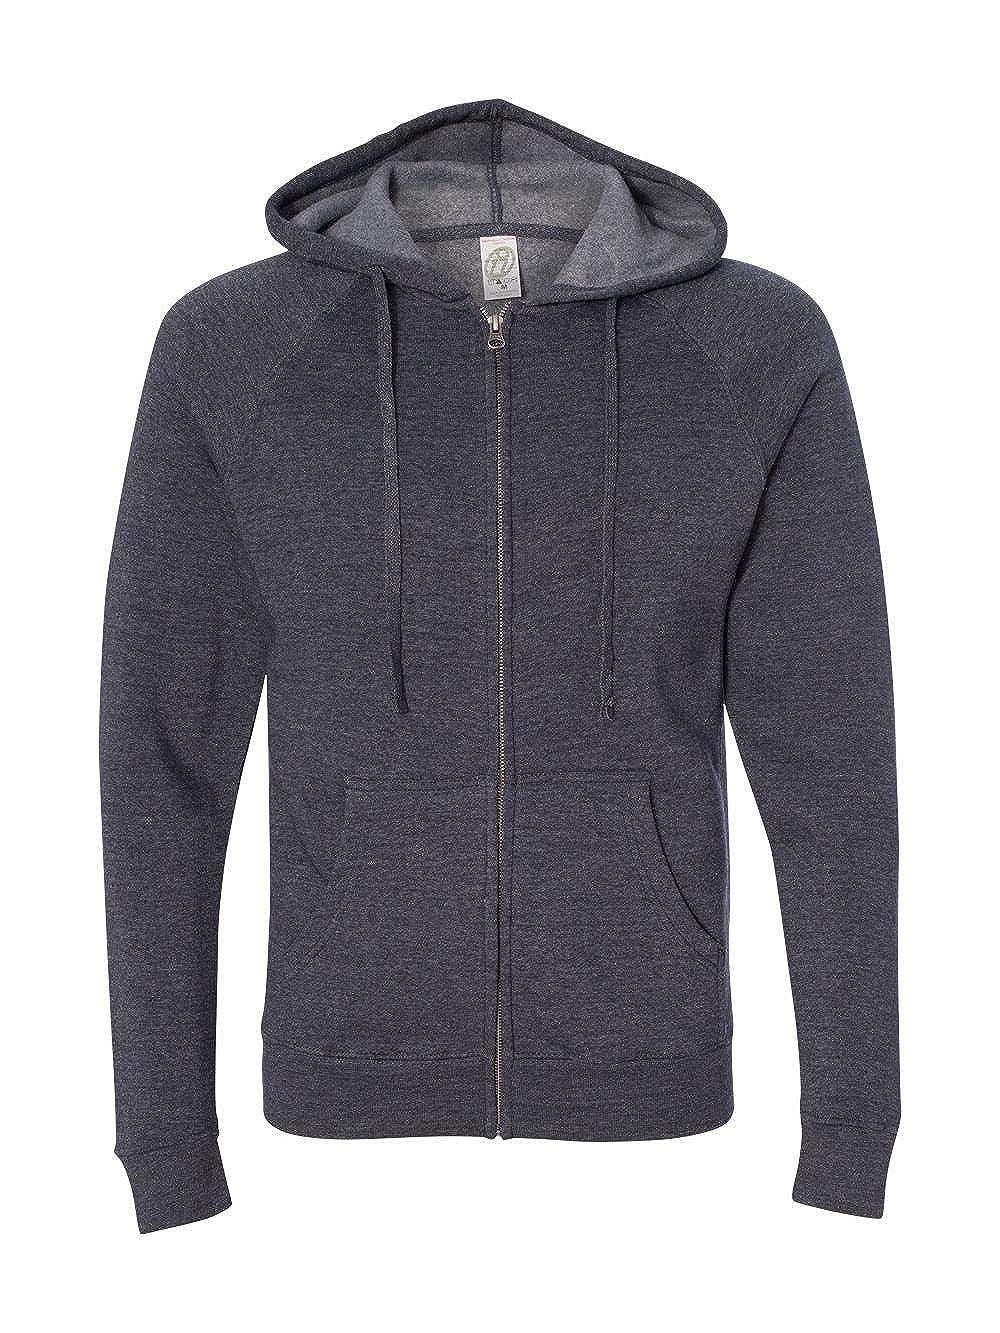 Independent Trading Co ITC-Unisex Special Blend Raglan Hooded Full-Zip Sweatshirt-PRM33SBZ